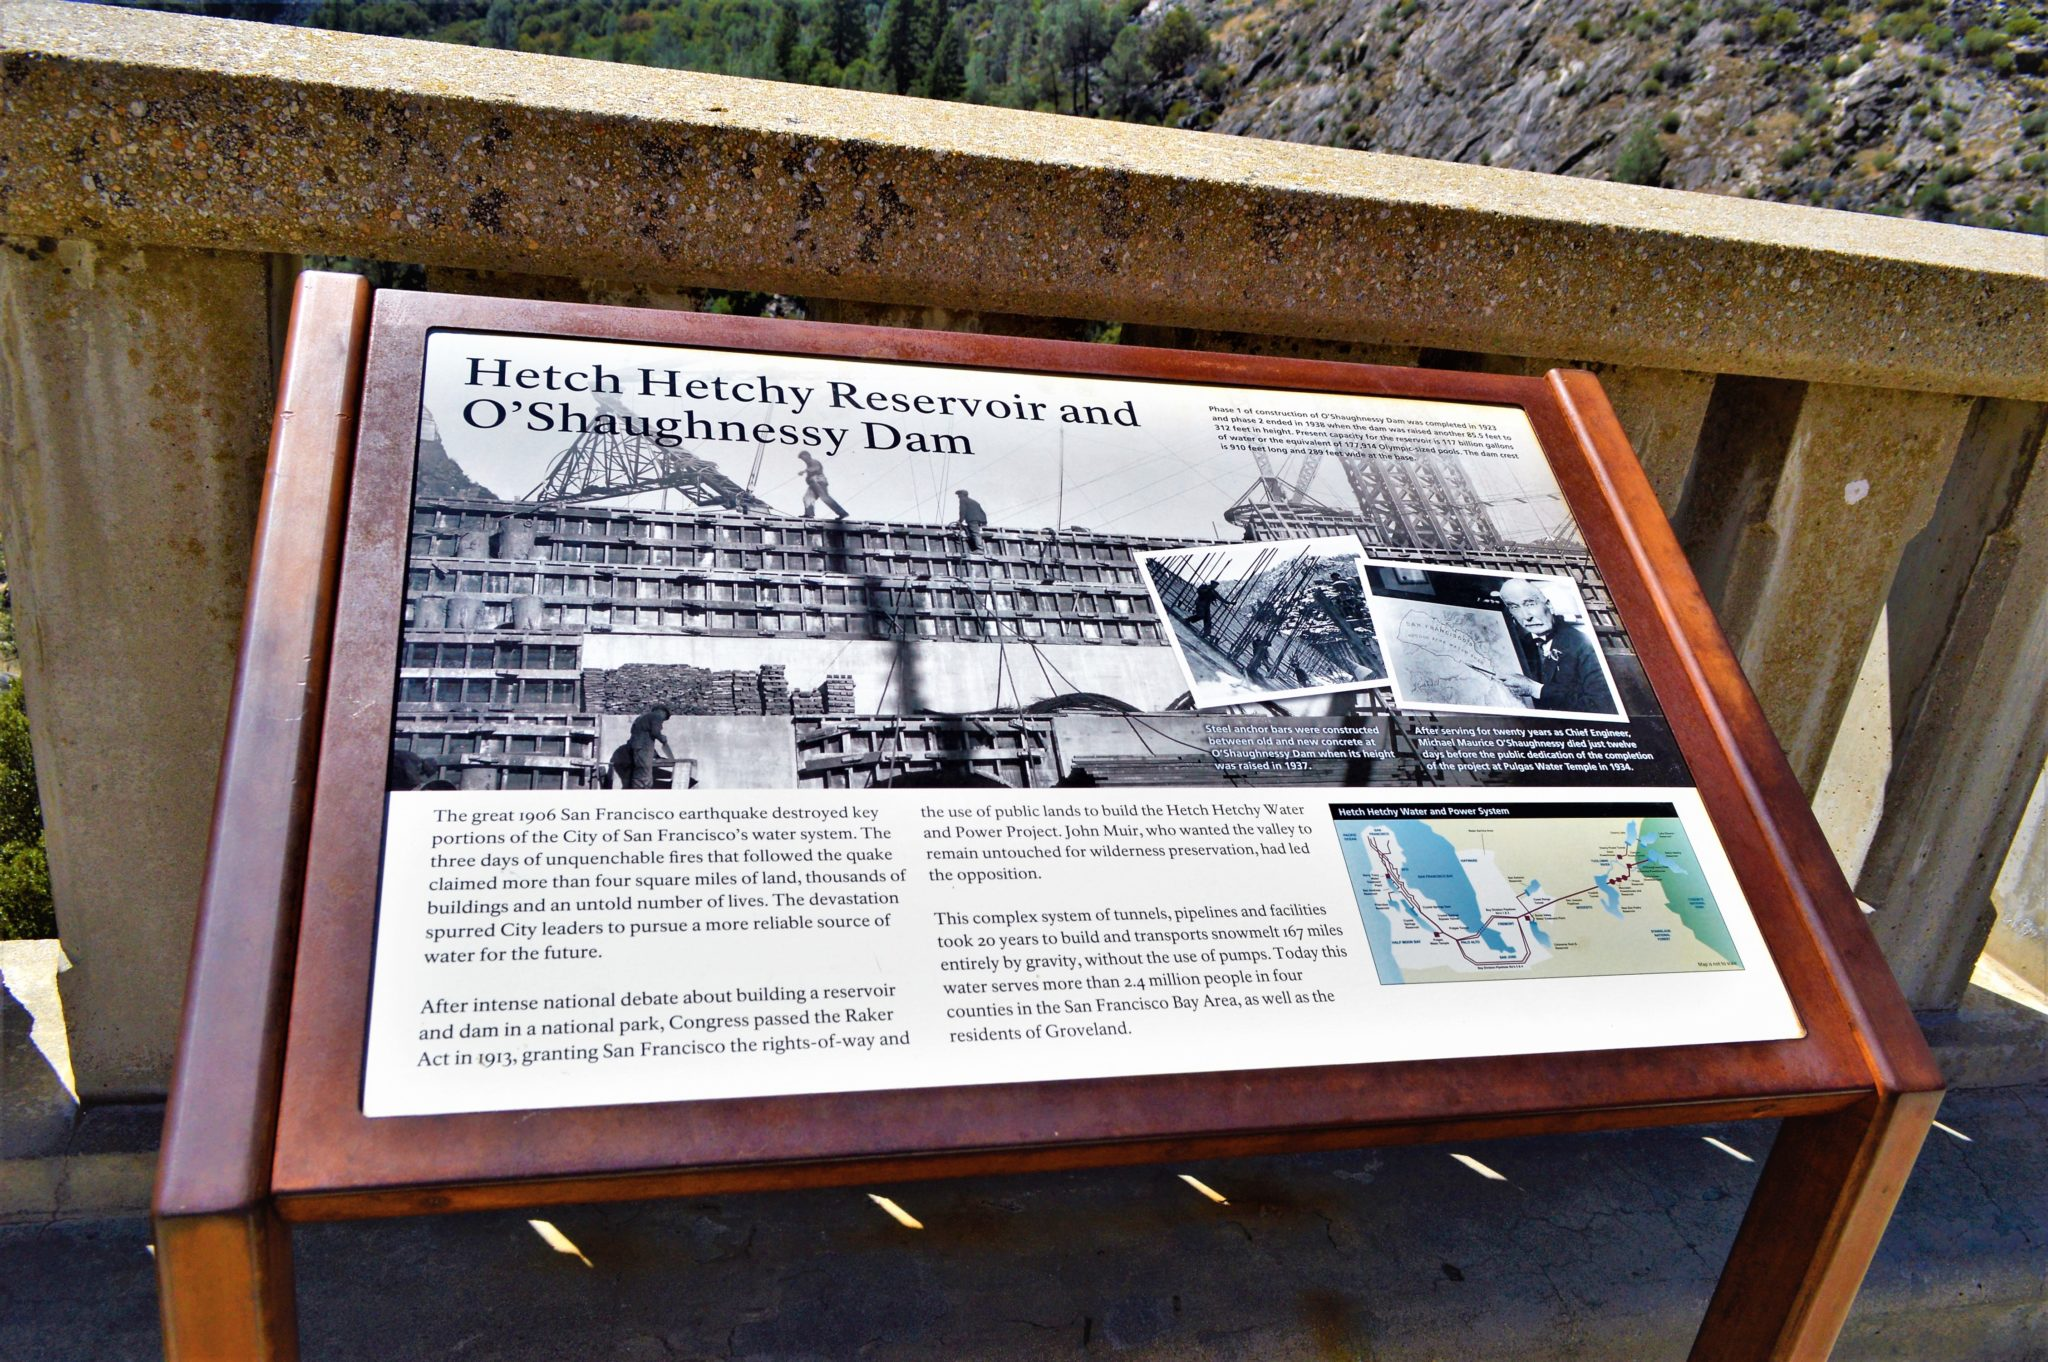 Hetch hetch o'shaunassey Dam, California information board